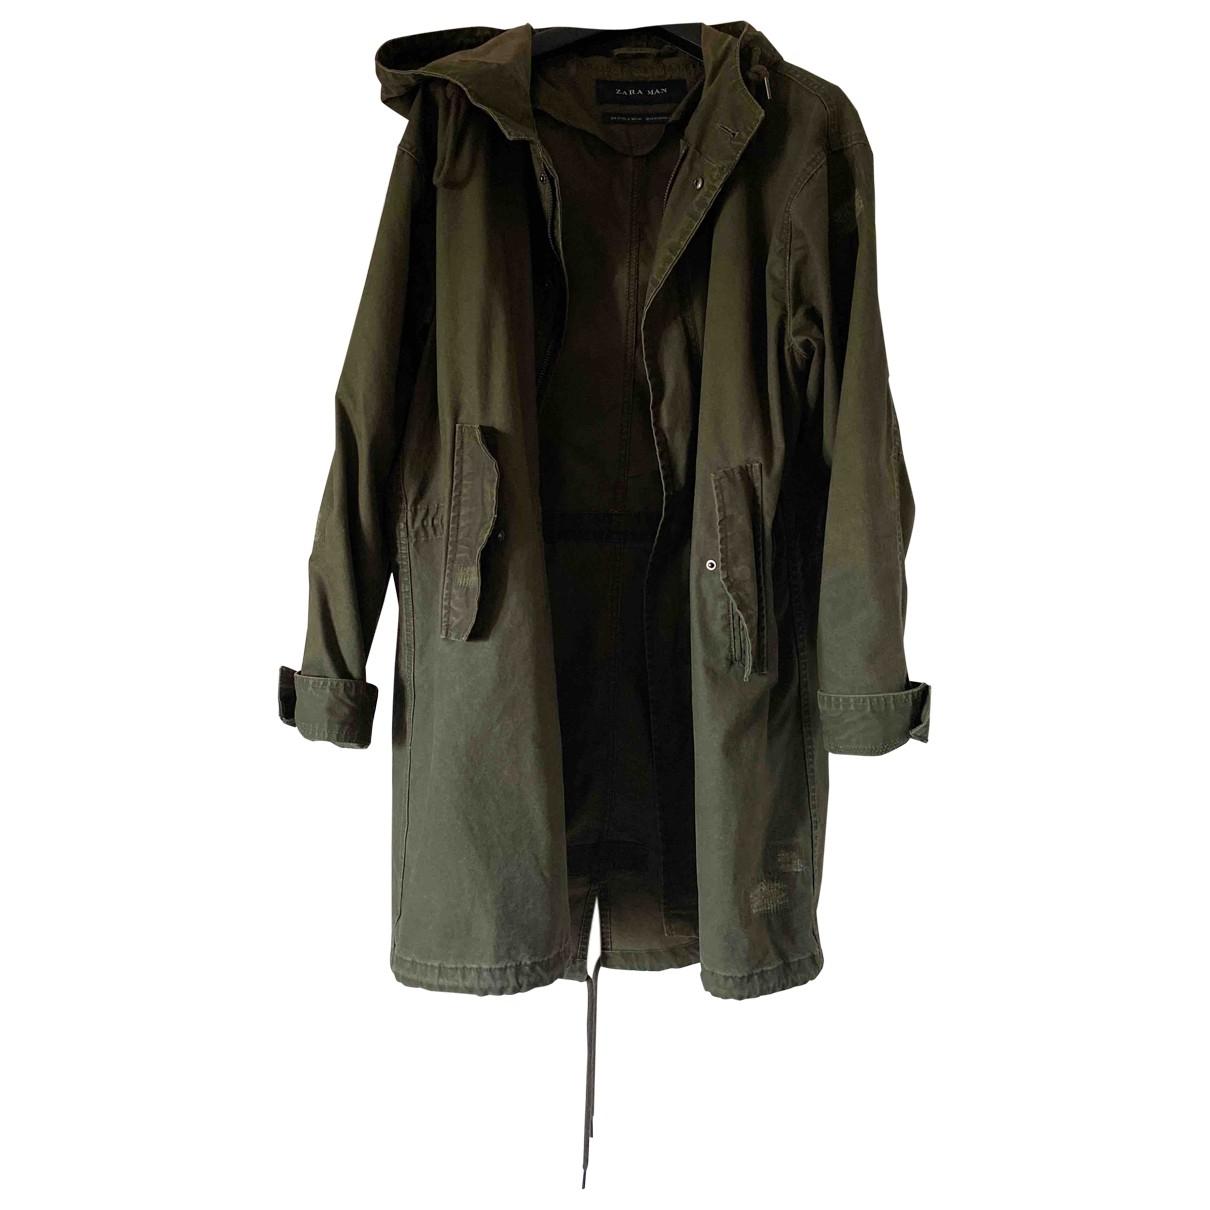 Zara - Manteau   pour homme en coton - vert